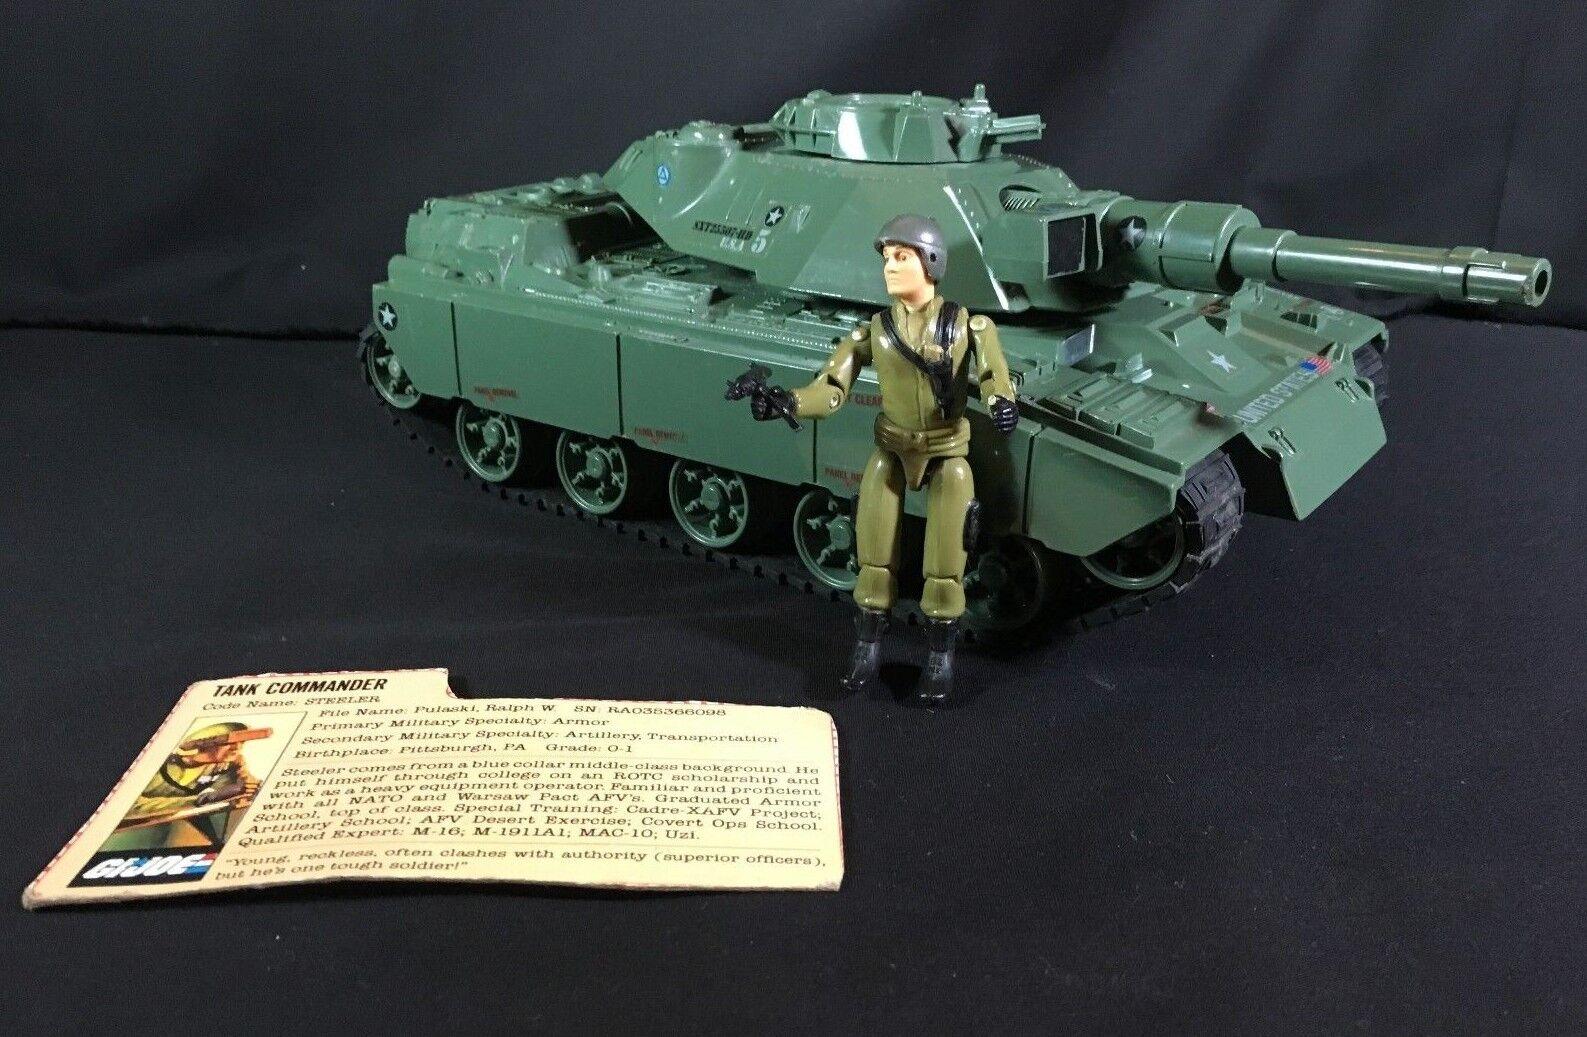 1987 GI Joe MODAT MOTORIZED BATTLE TANK  Driver  Comuomoder STEELER & File autod  fabbrica diretta